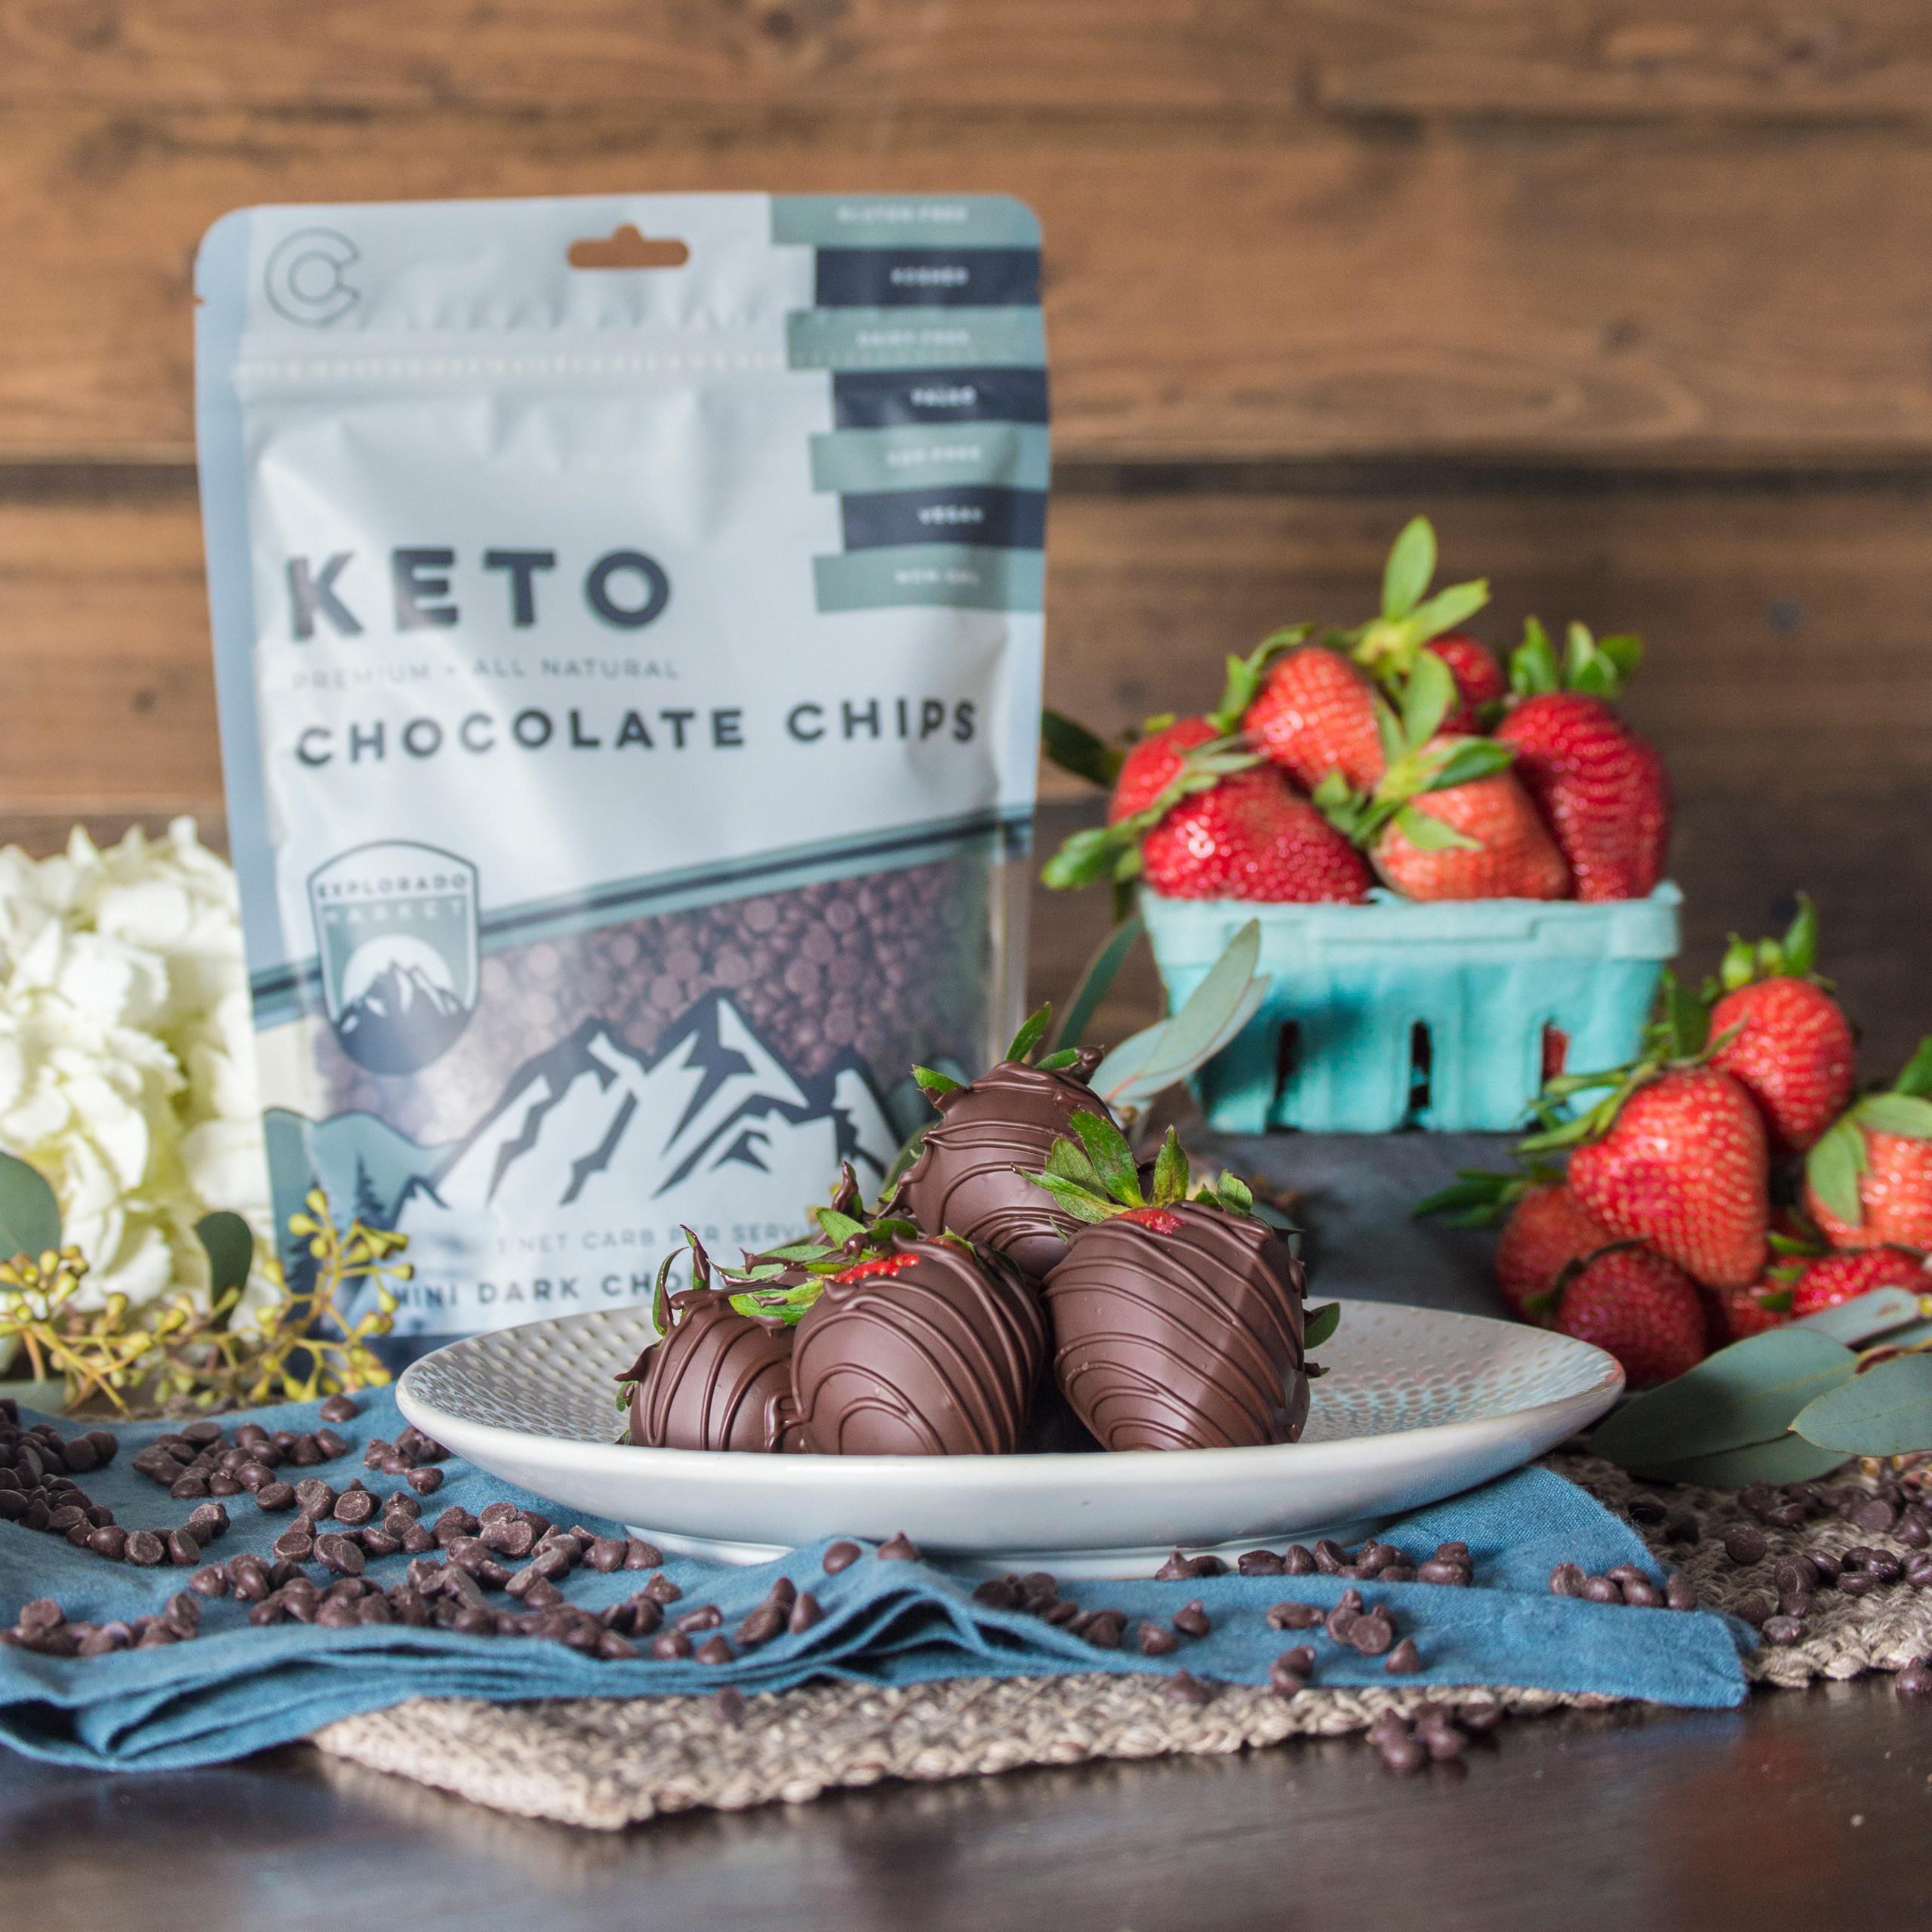 Explorado Market Announces Launch of New Ultra Clean, Vegan